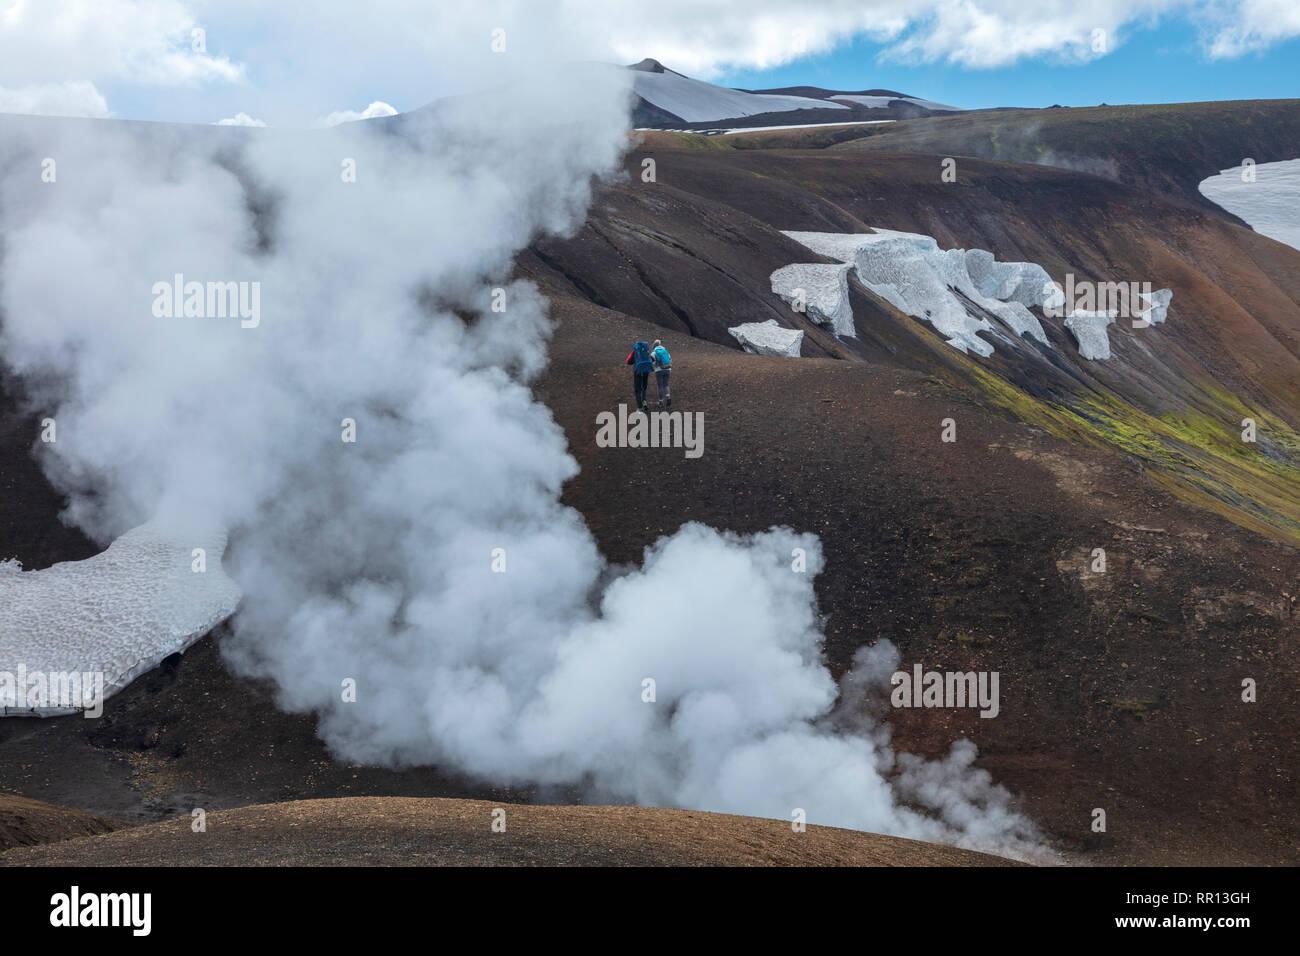 Hikers on the Laugavegur trail near Storihver hot springs, between Landmannalaugar and Hrafntinnusker. Central Highlands, Sudhurland, Iceland. - Stock Image